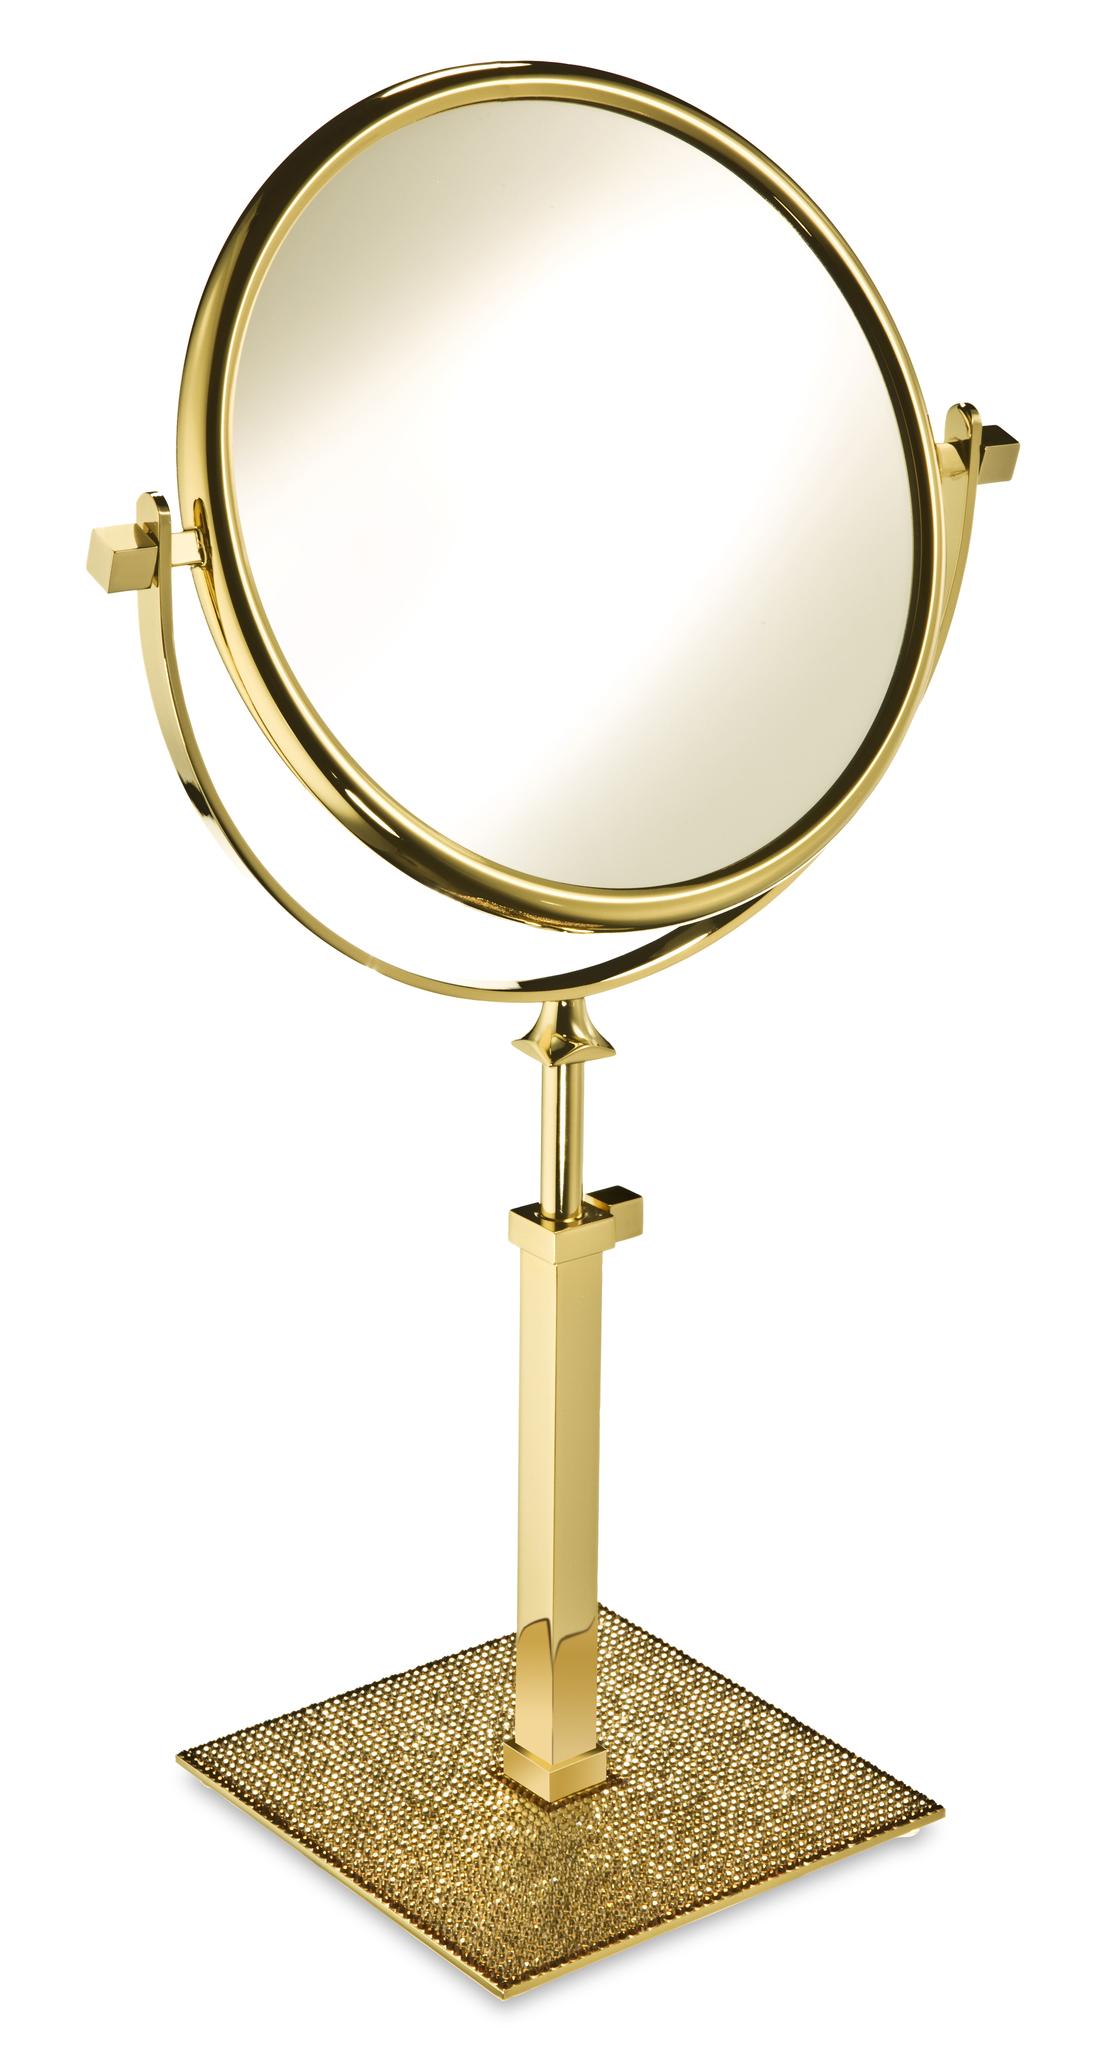 Зеркала Элитное зеркало косметическое 99535O 7XOP Starlight от Windisch elitnoe-zerkalo-kosmeticheskoe-99535-starlight-ot-windisch-ispaniya.jpg